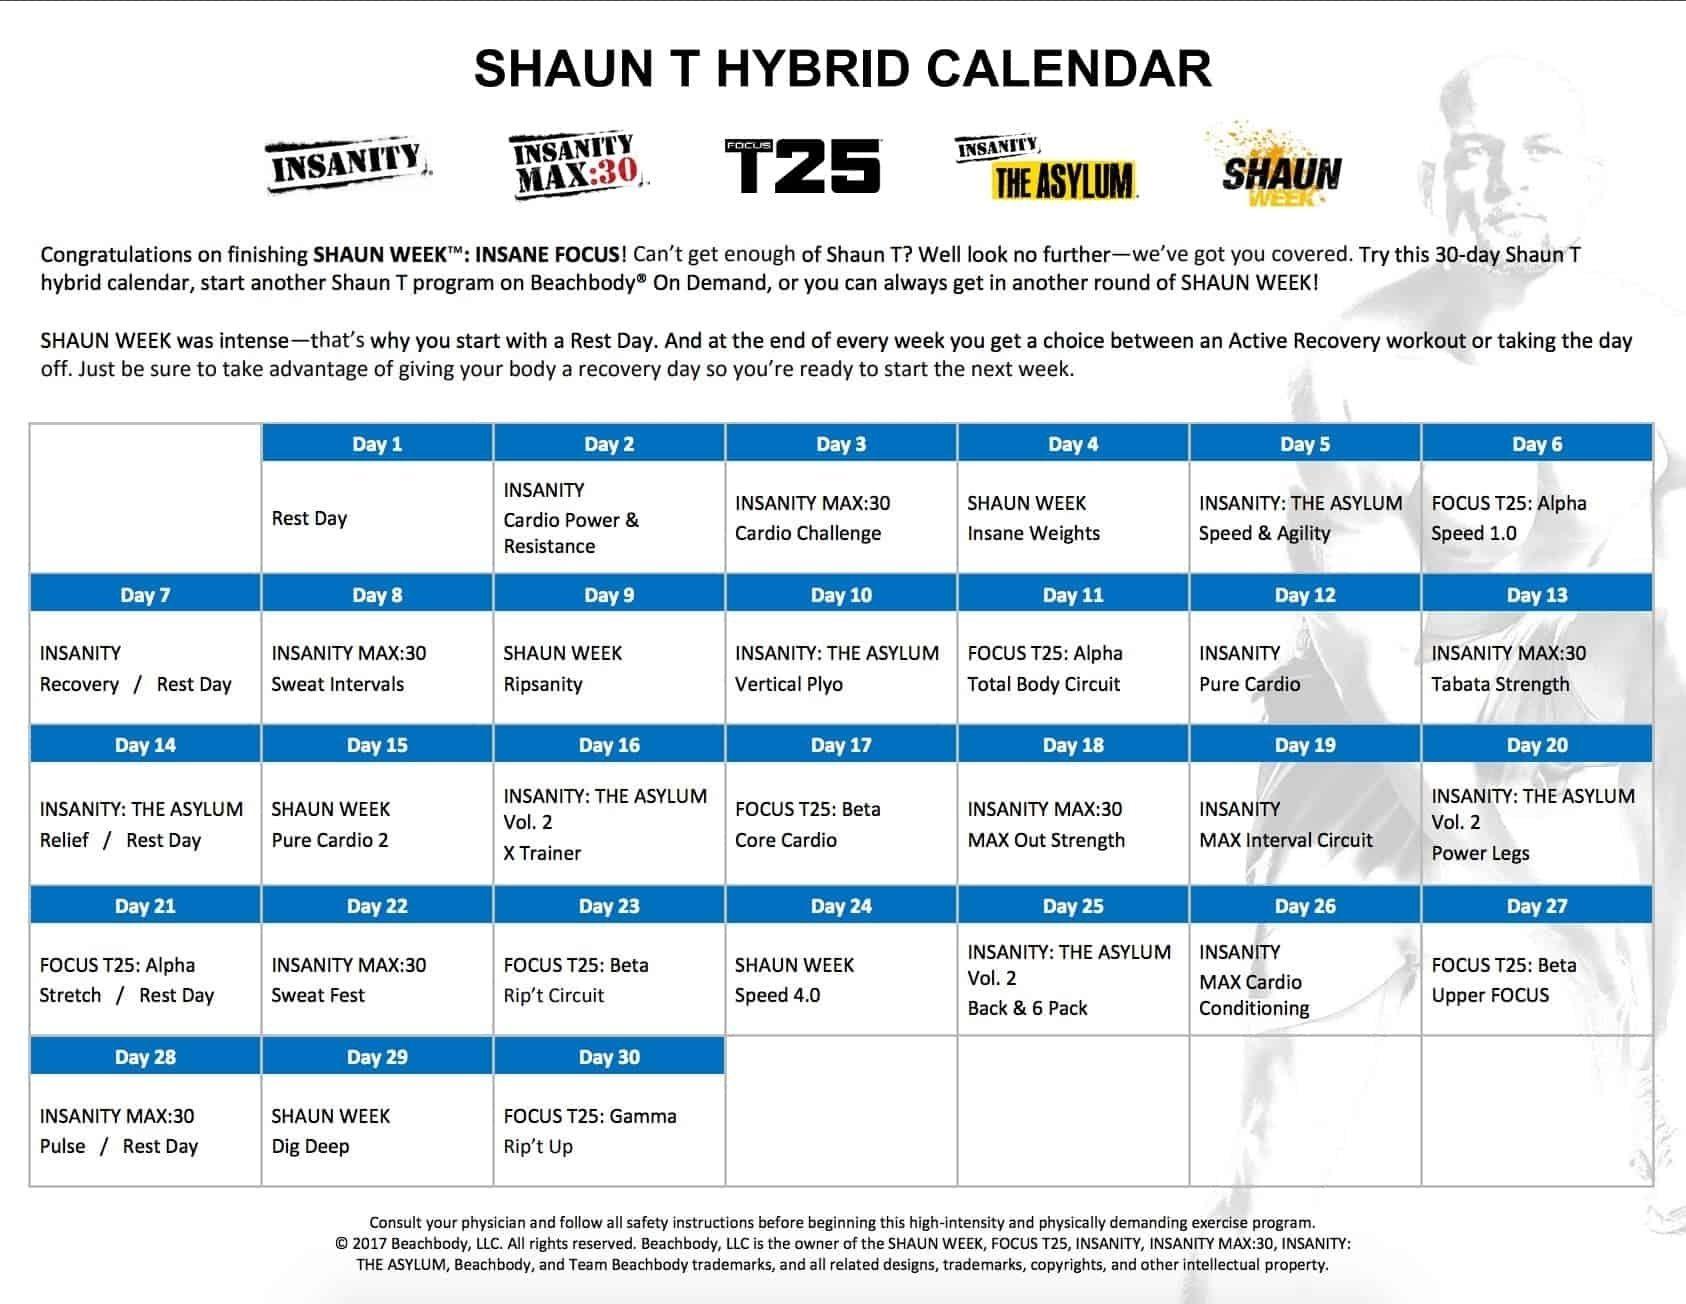 Shaun T Week Calendar In 2020 | Shaun Week, Shaun T Week with Shaun T Hybrid Calendar